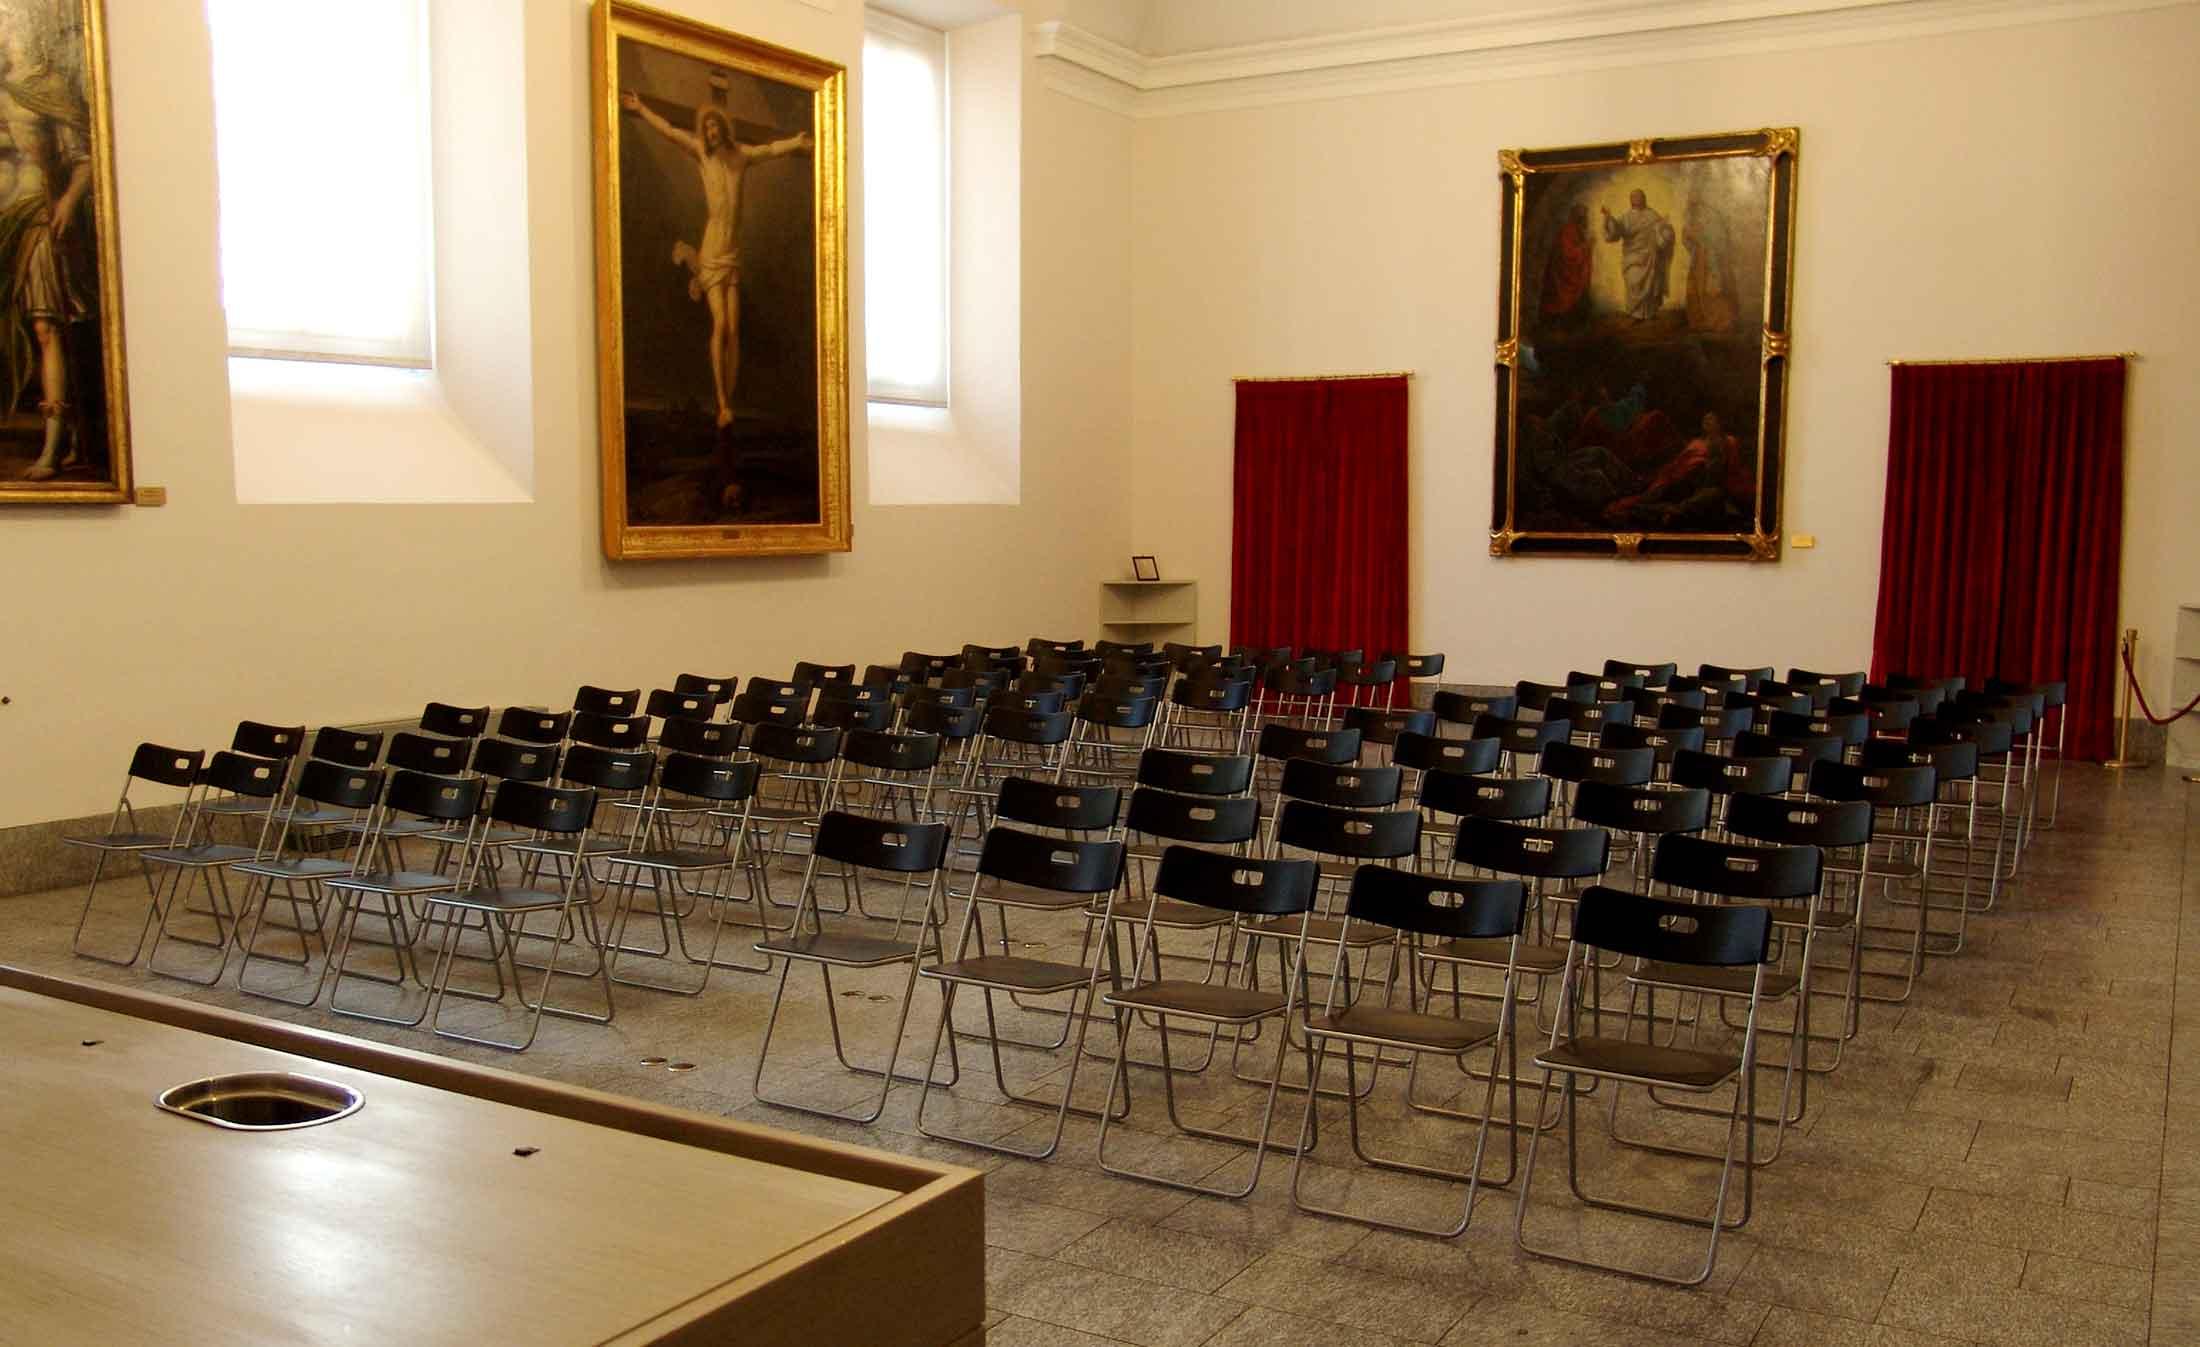 Dimensioni Sala Conferenze 100 Posti.Sale Per Eventi Convegni E Presentazioni Veneranda Biblioteca